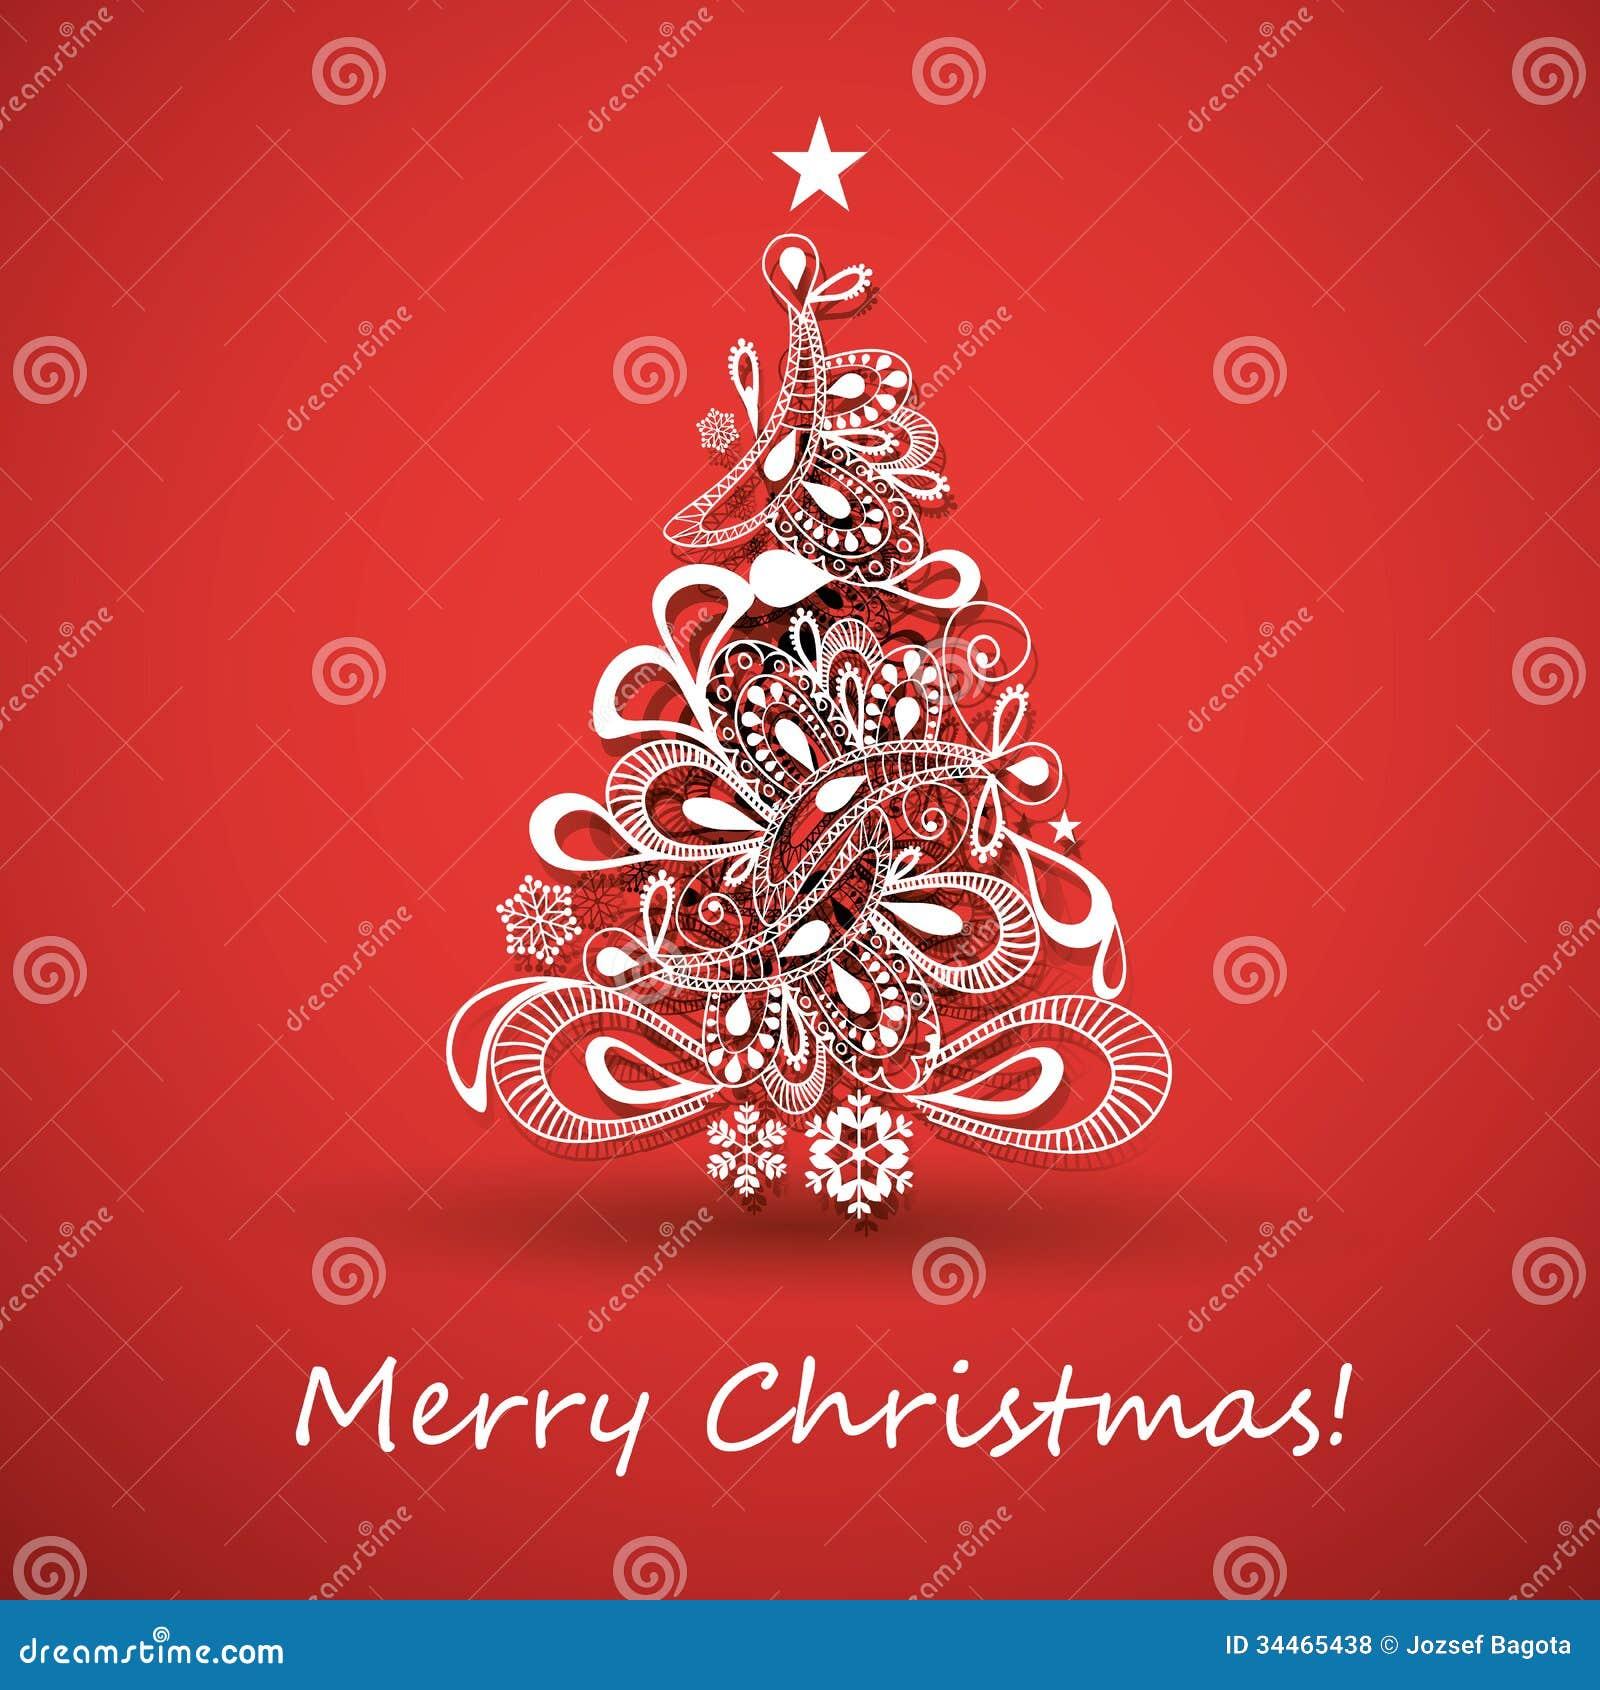 Cartoline Di Auguri Di Natale.Cartolina D Auguri Di Natale Illustrazione Vettoriale